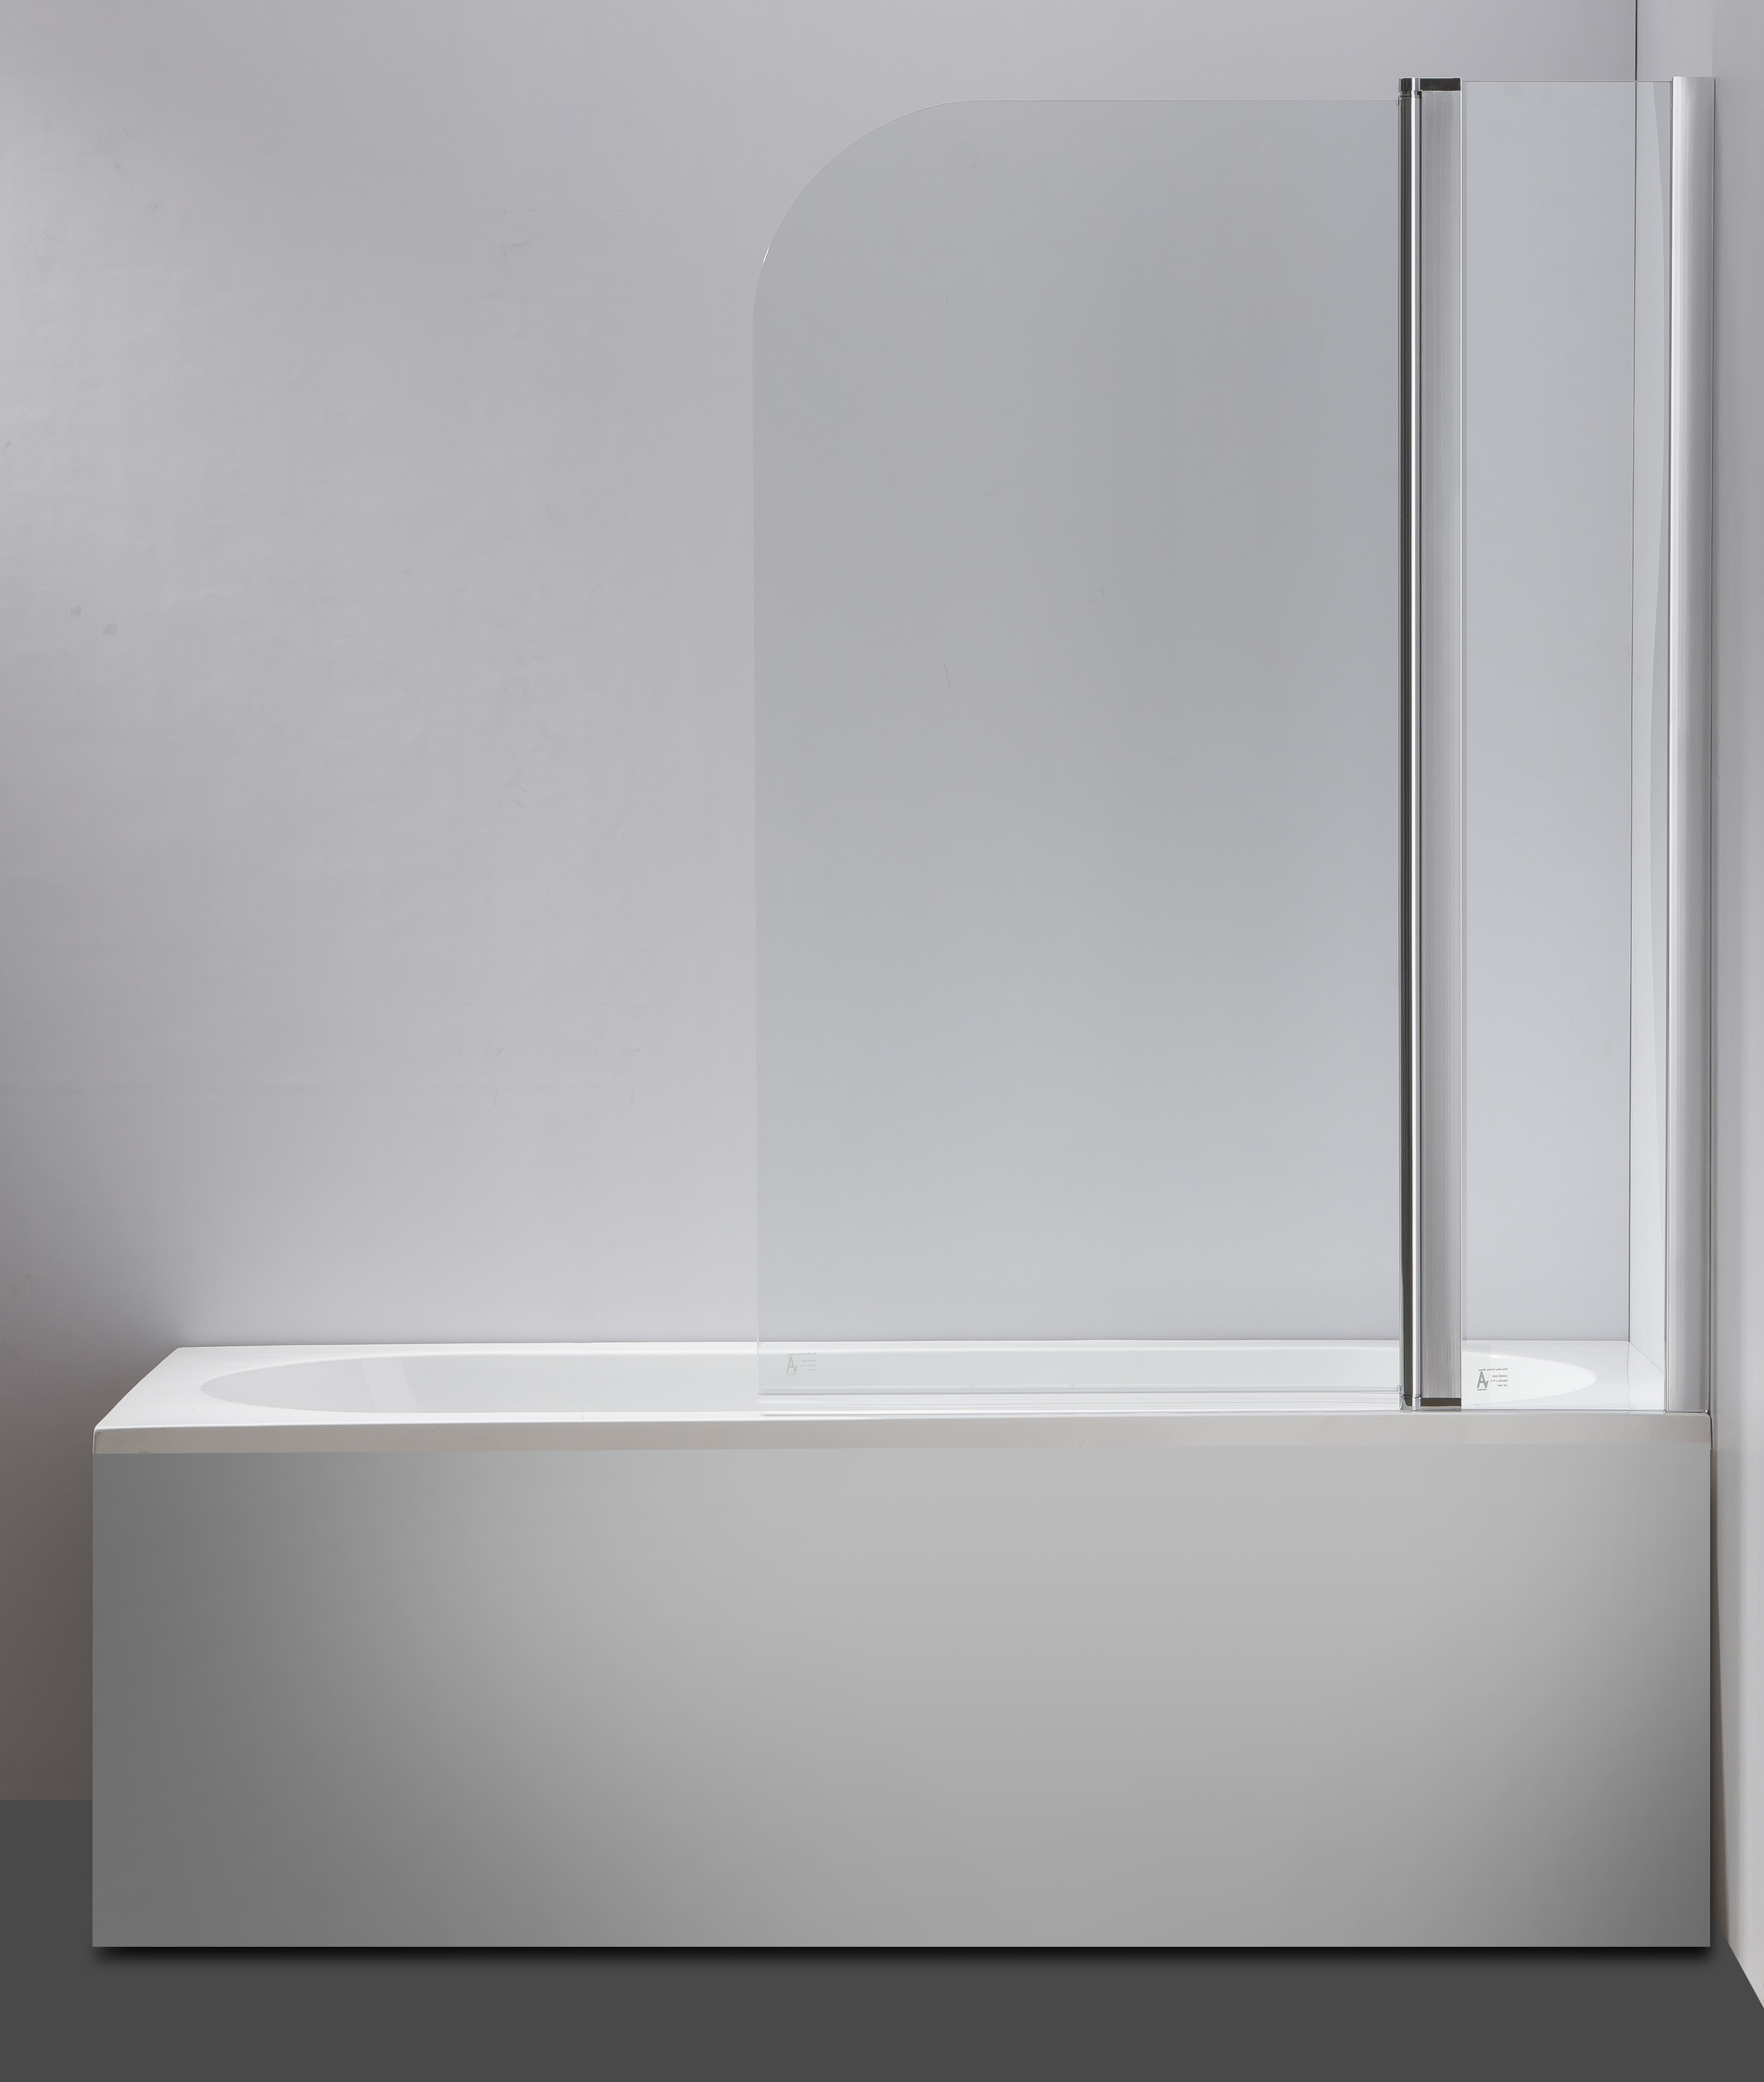 180° Pivot Door 6mm Safety Glass Bath Shower Screen 1000x1400mm By Della Francesca  Z2677